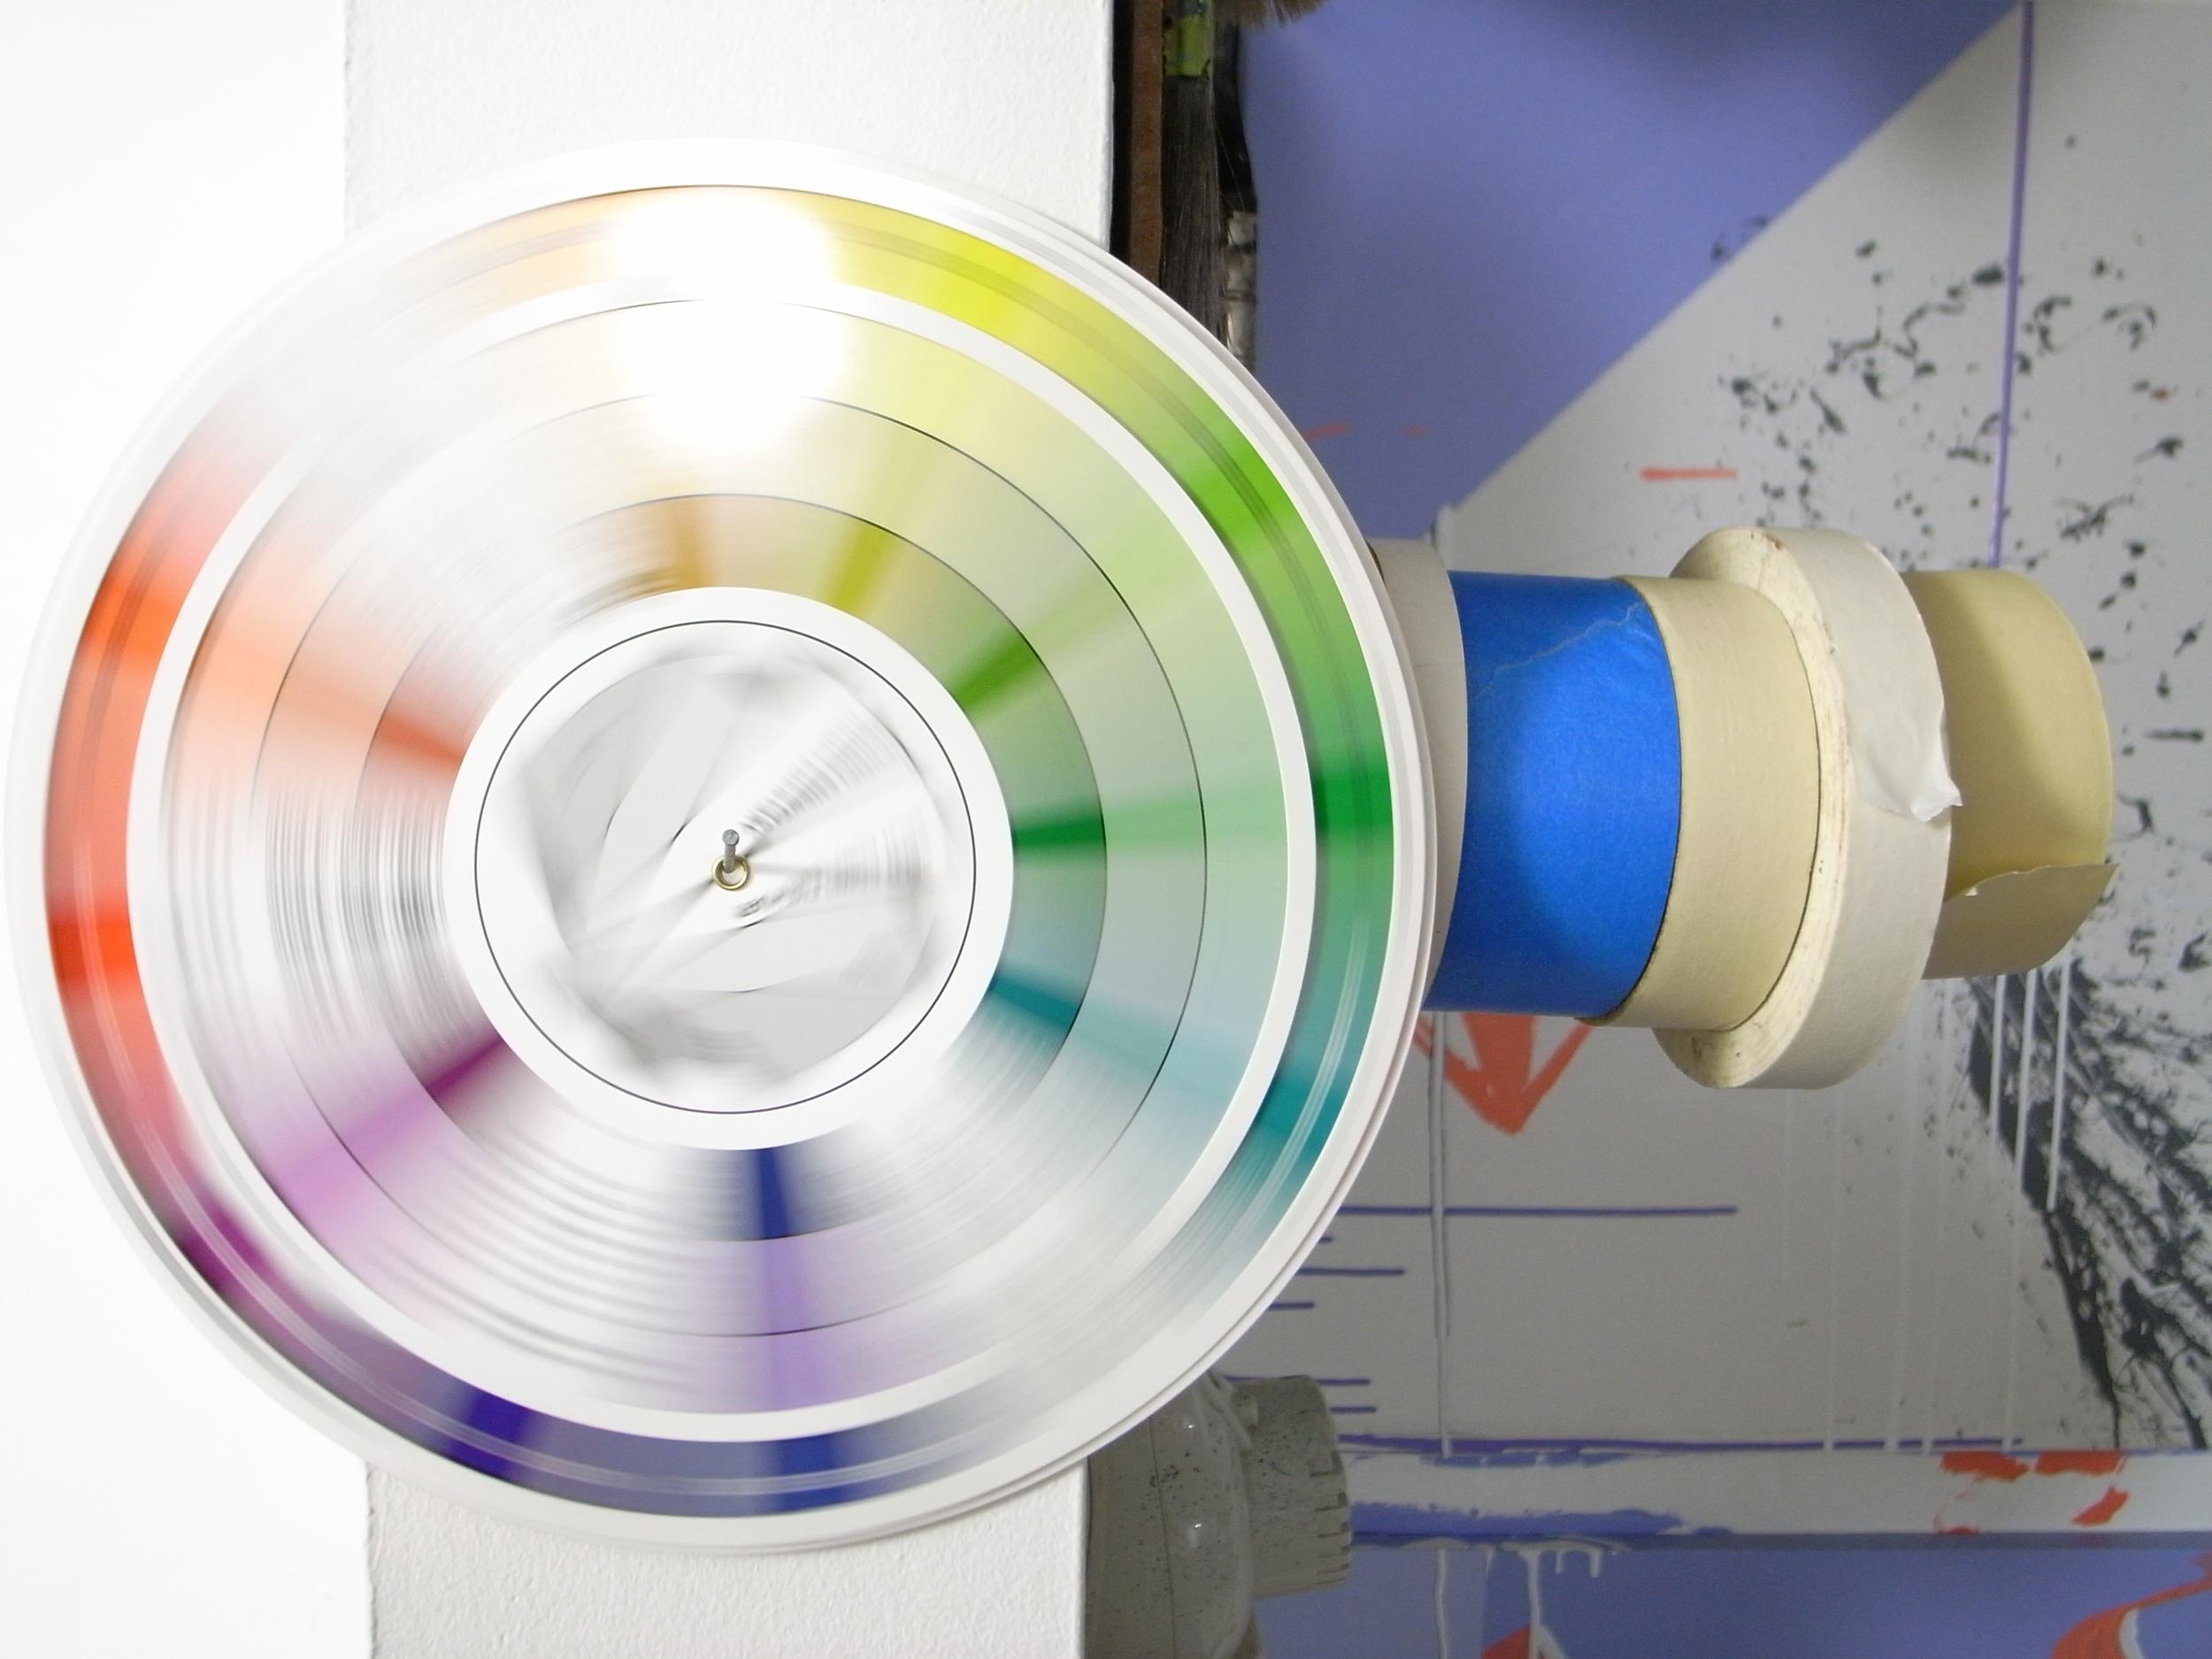 Colorwheel Photo by Dustin Klein